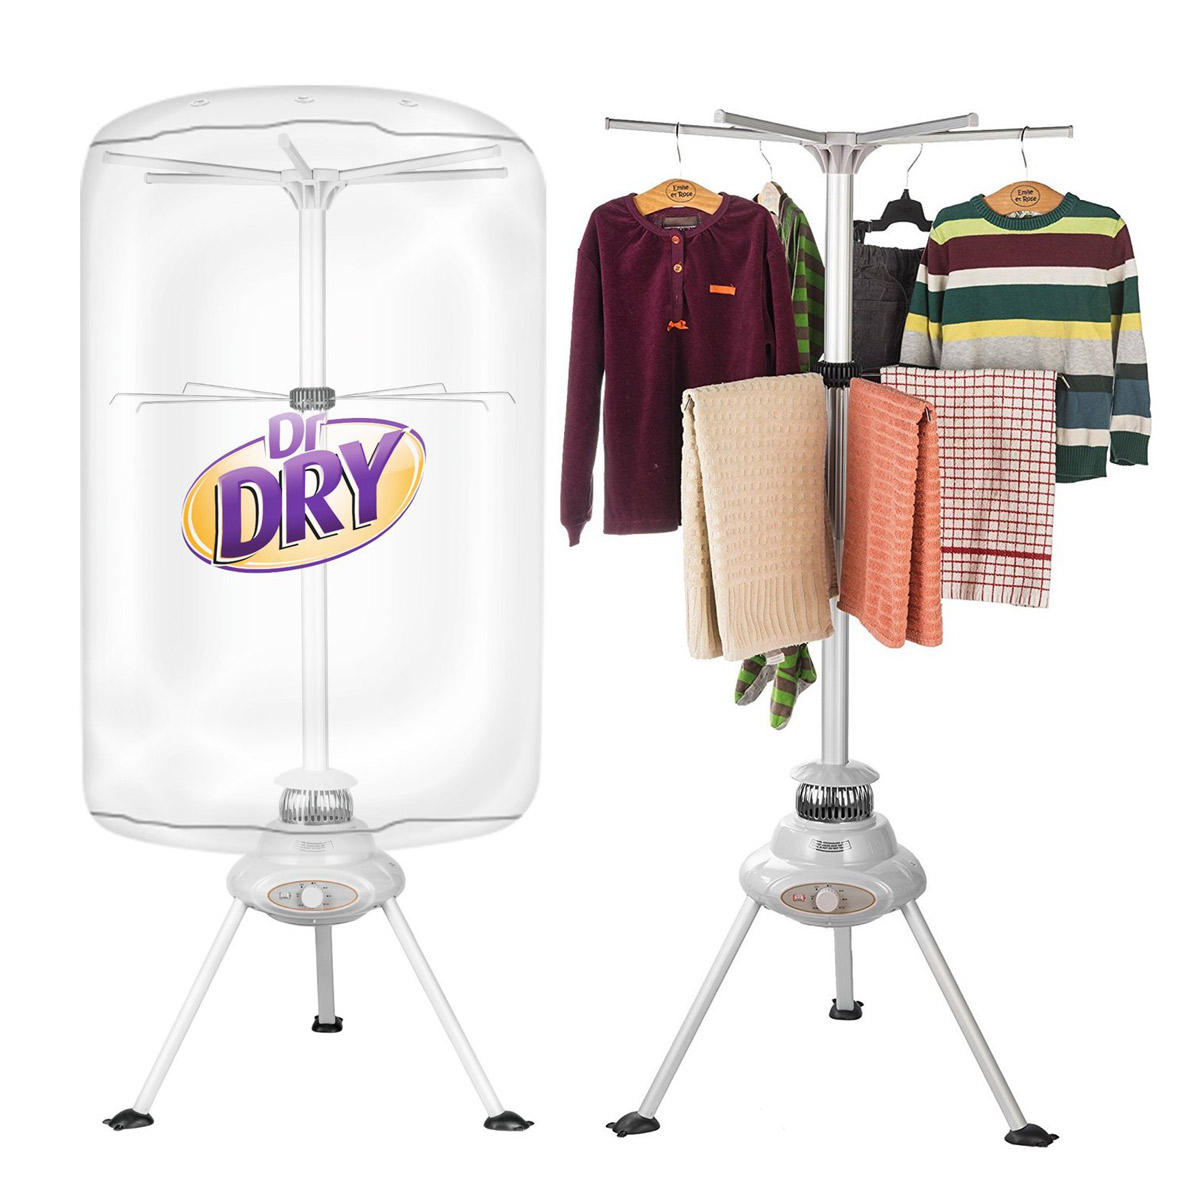 dr dry portable space saving clothes dryer. Black Bedroom Furniture Sets. Home Design Ideas